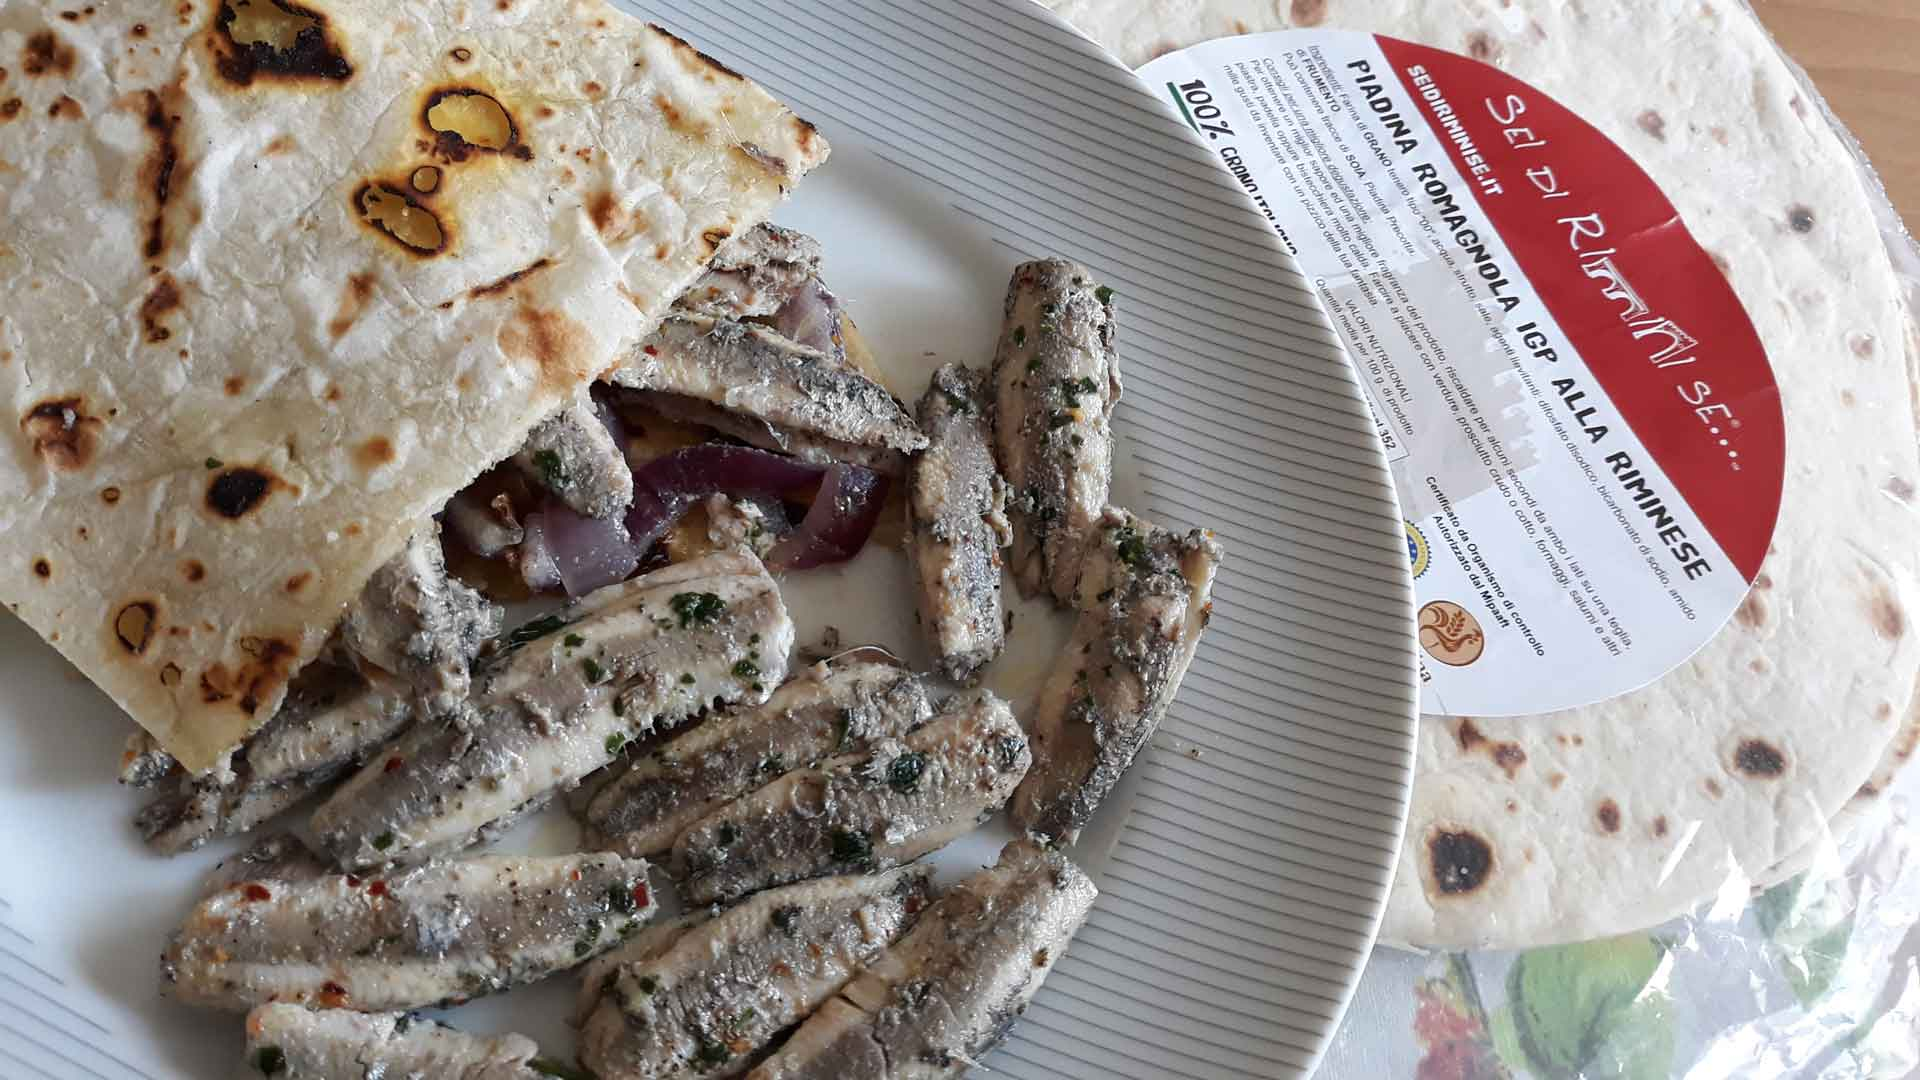 Piadina con alici marinate a caldo